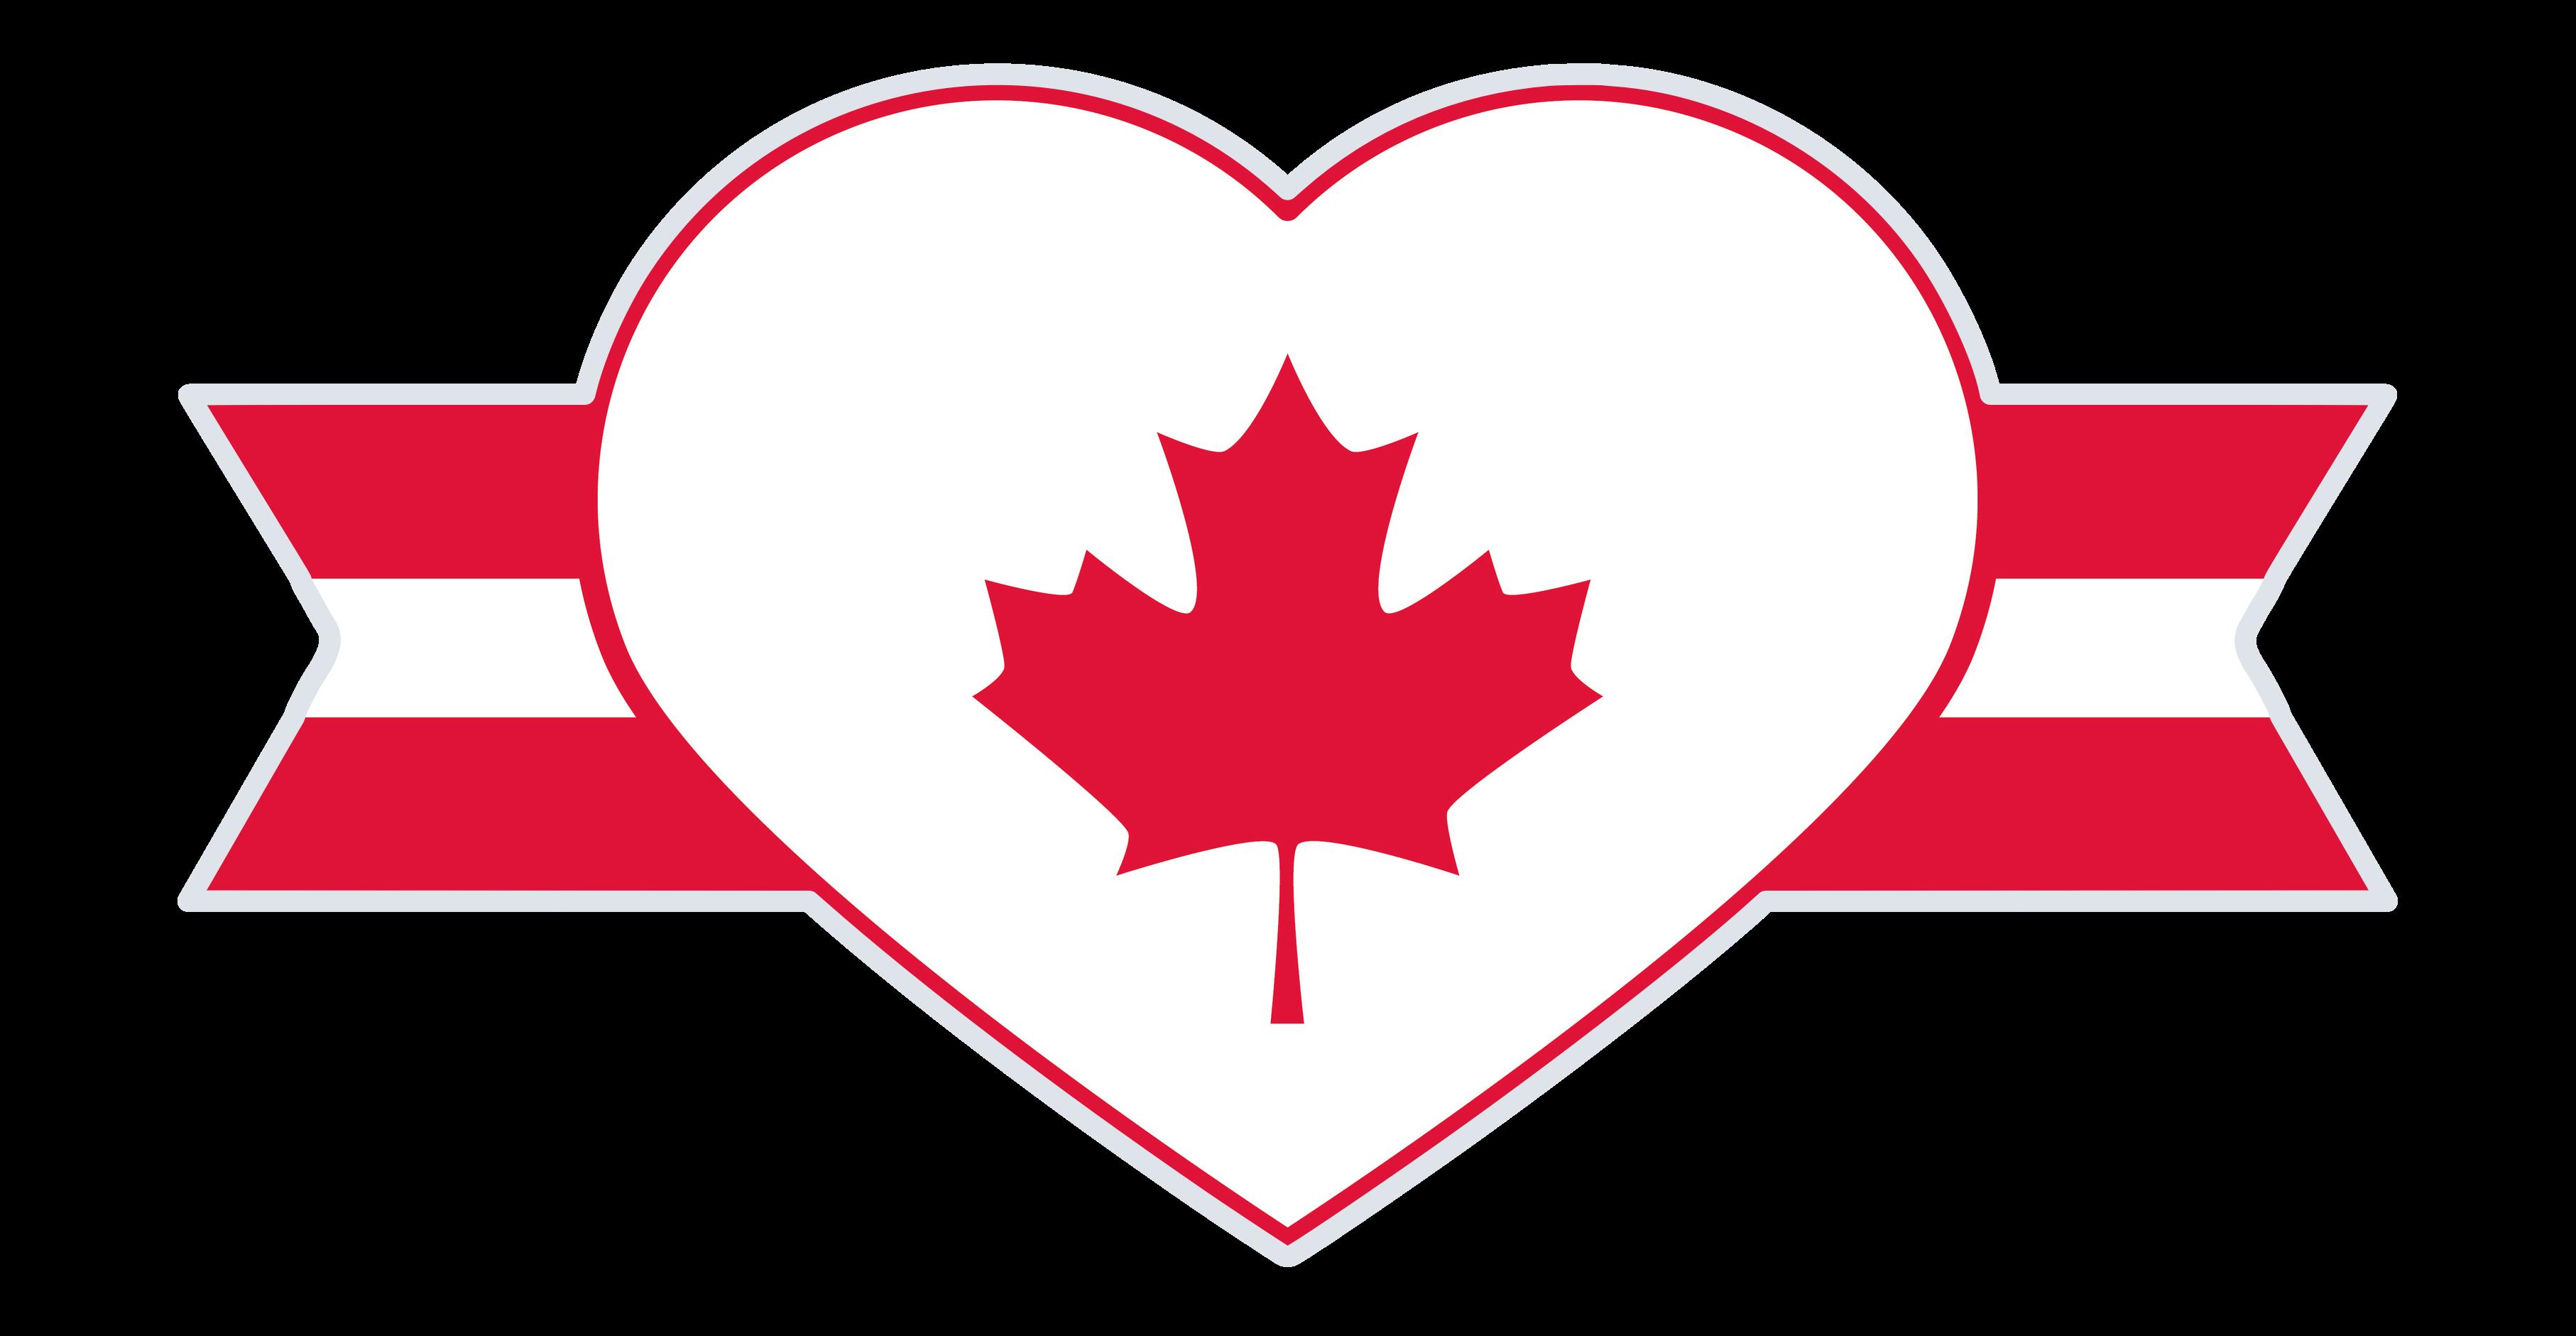 CANADIAN-HEART-1